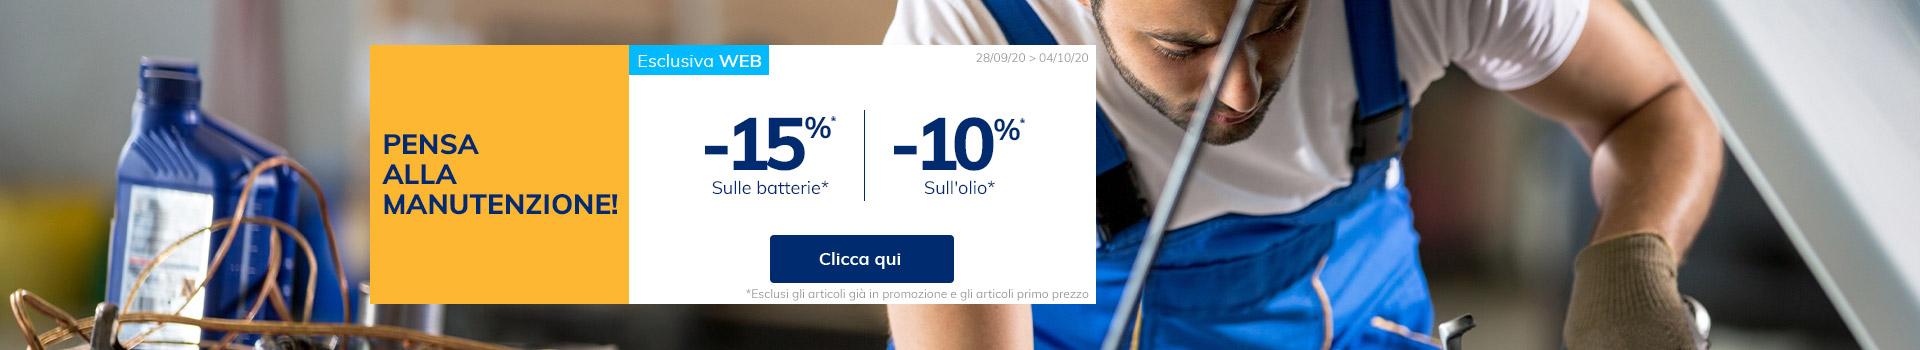 -15% sulle batterie -10% sull'olio